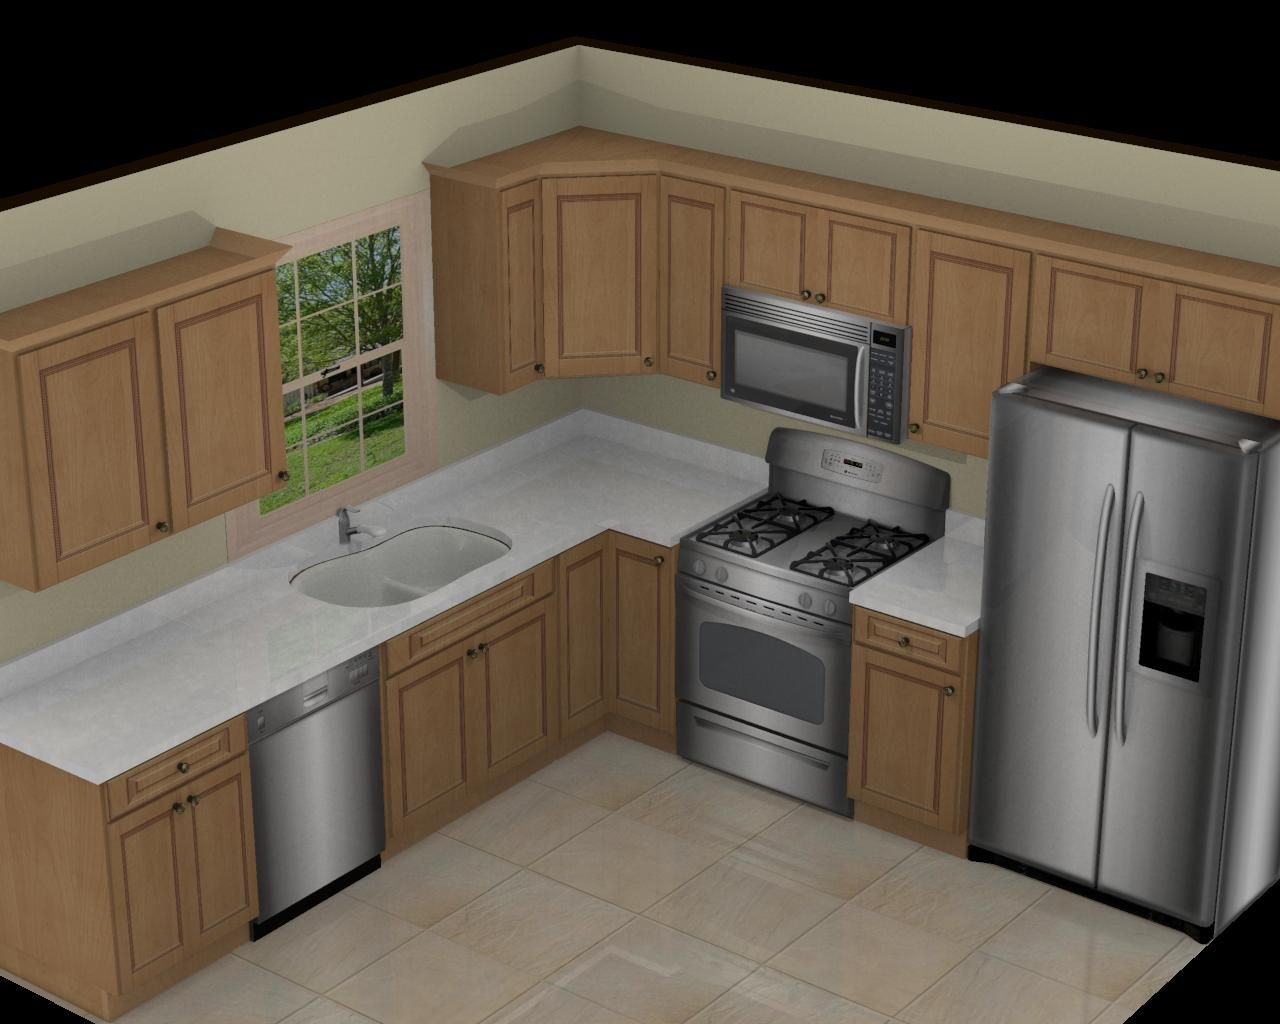 Best Kitchen Gallery: L Shaped Kitchen Designs Ideas For Your Beloved Home Kitchen of L Shaped Kitchen Cabinets on rachelxblog.com